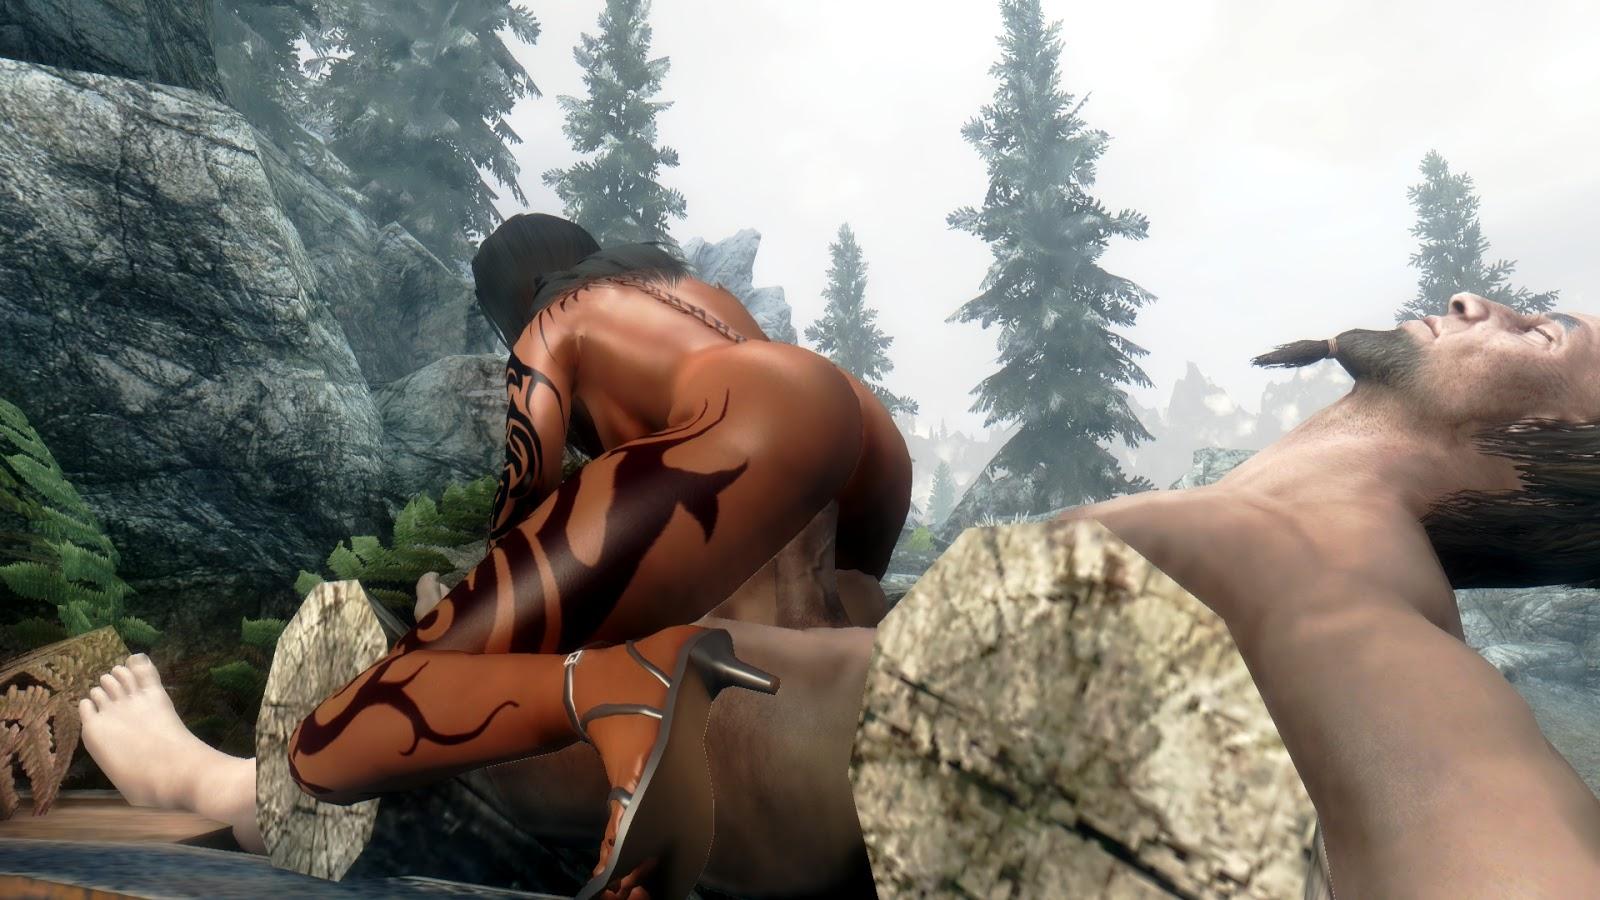 Nude skyrim male xxx videos